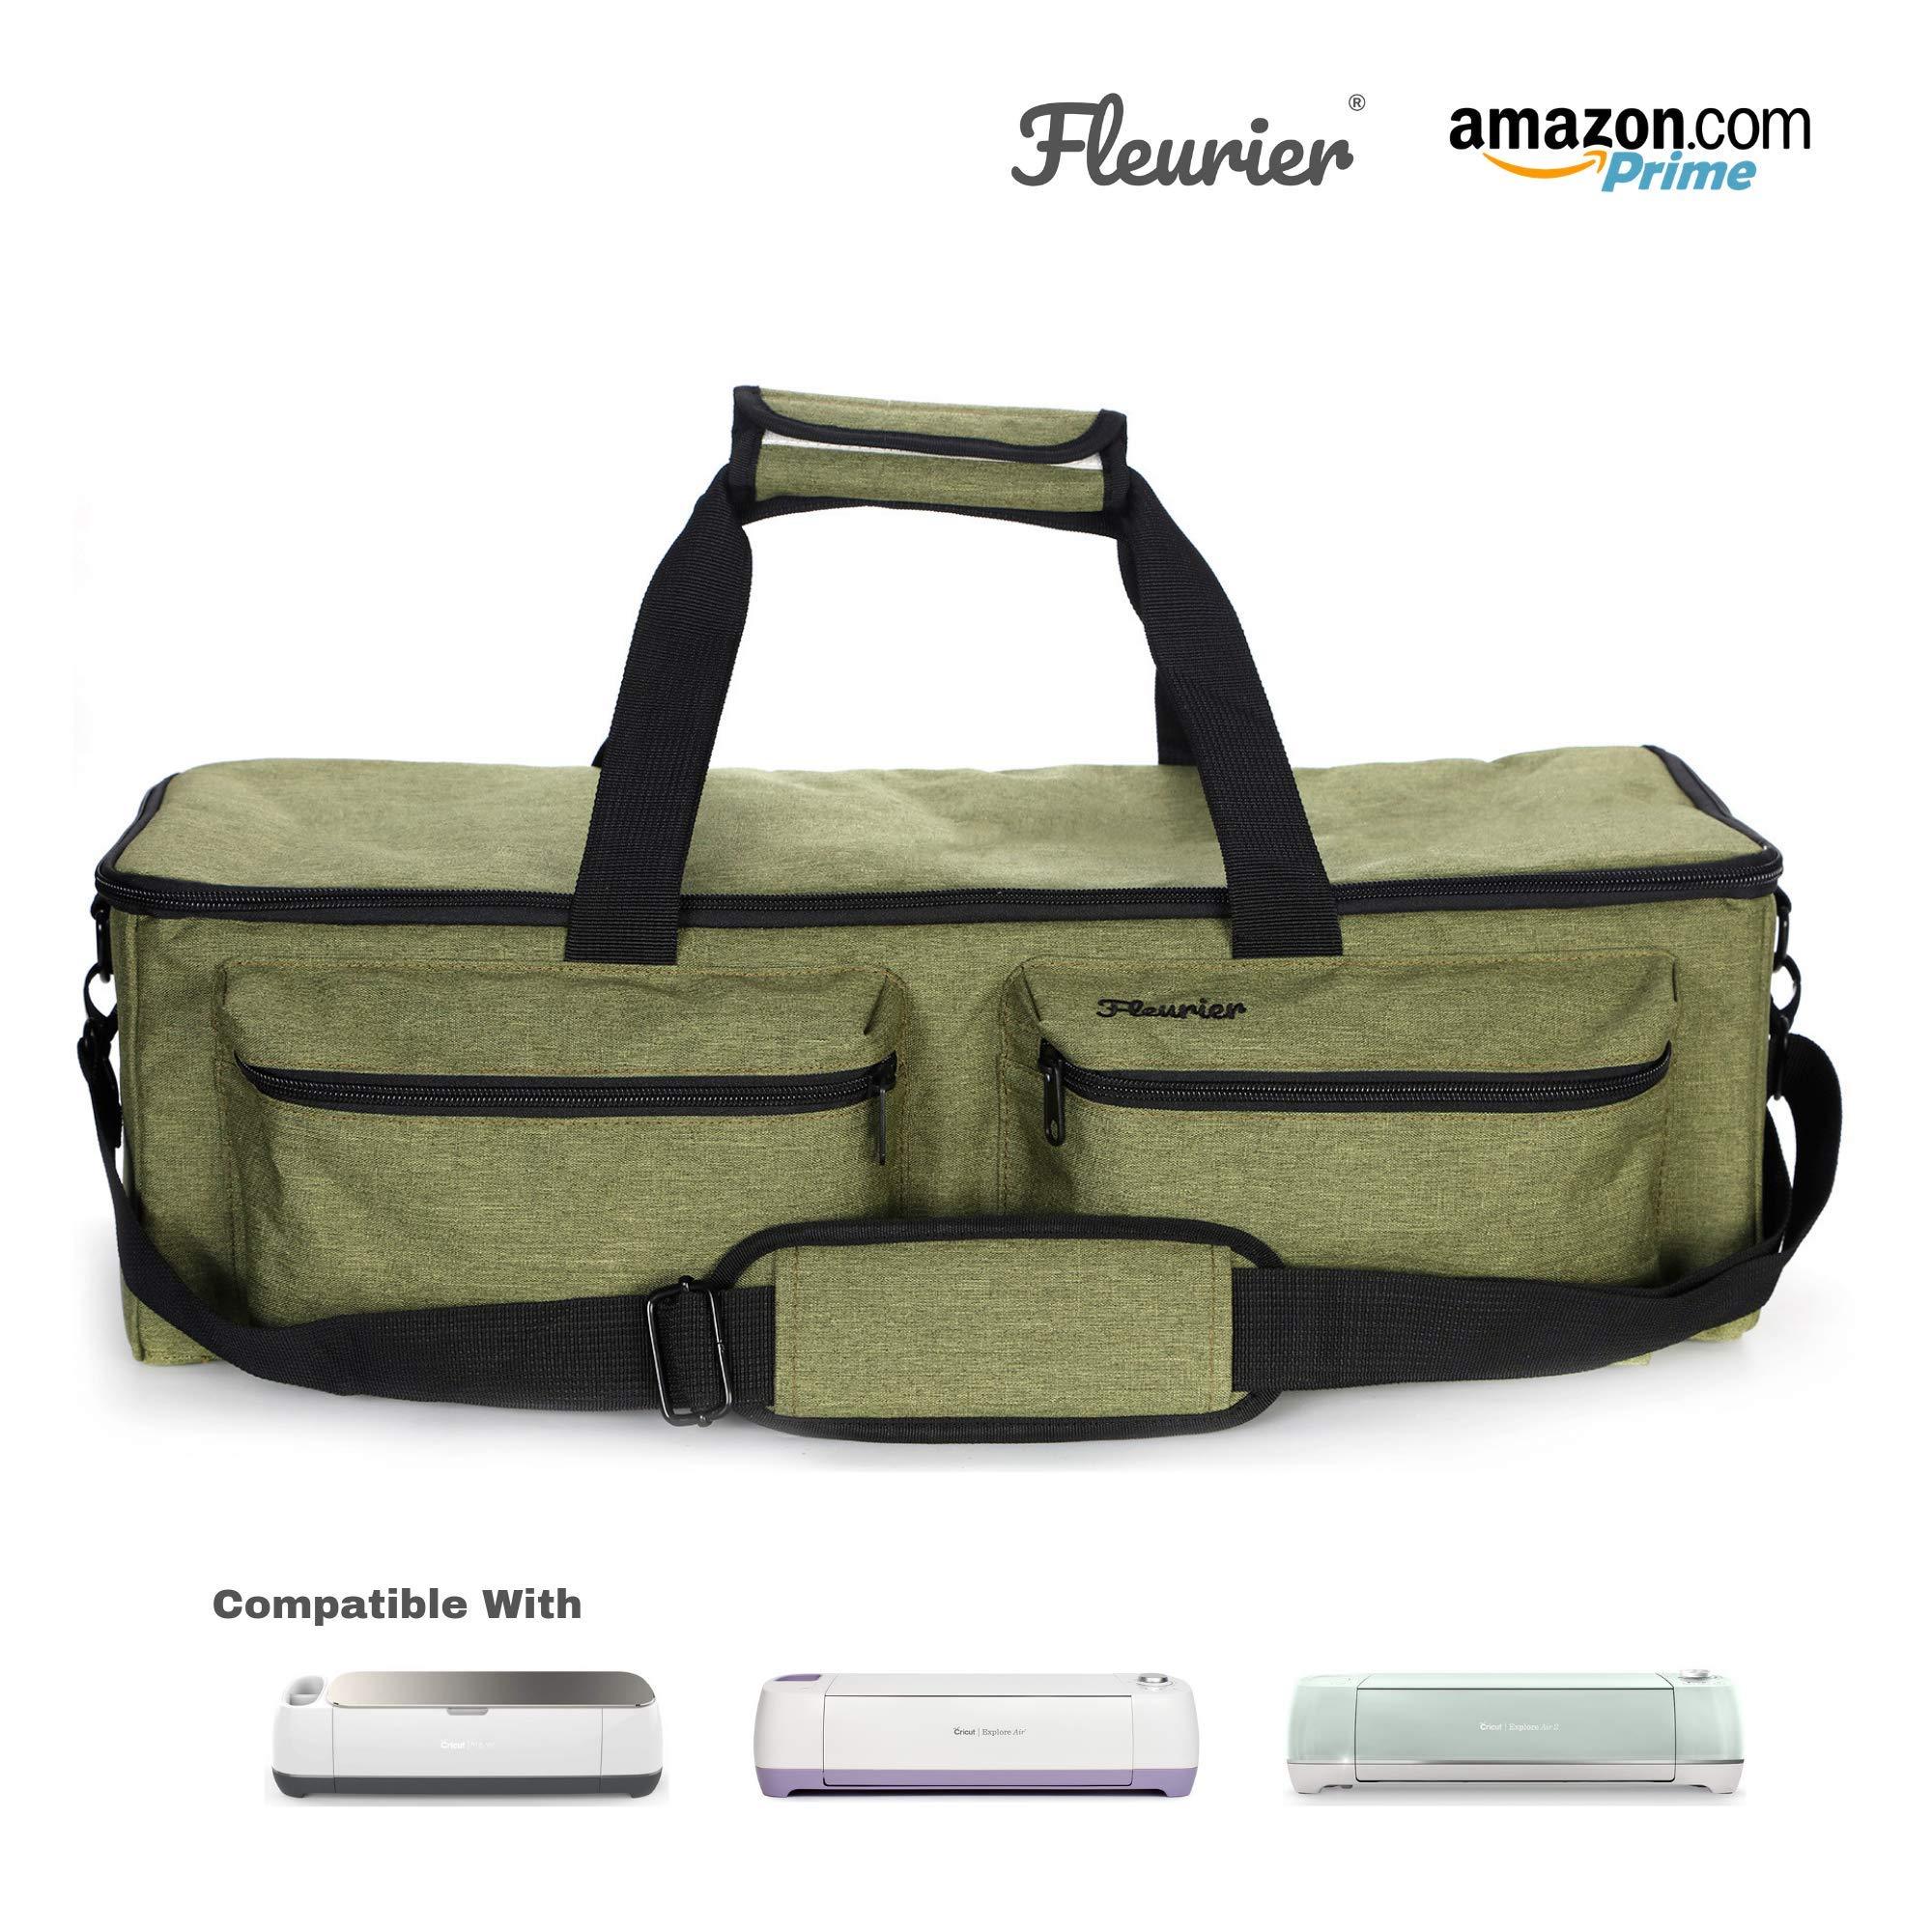 Fleurier Carrying Bag Tote Travel Bag Accessories Storage Bag Carrying Case for Cricut Explore Air and Maker Cricut Explore Air 2, Silhouette Cameo 3, Cricut Maker (Green)